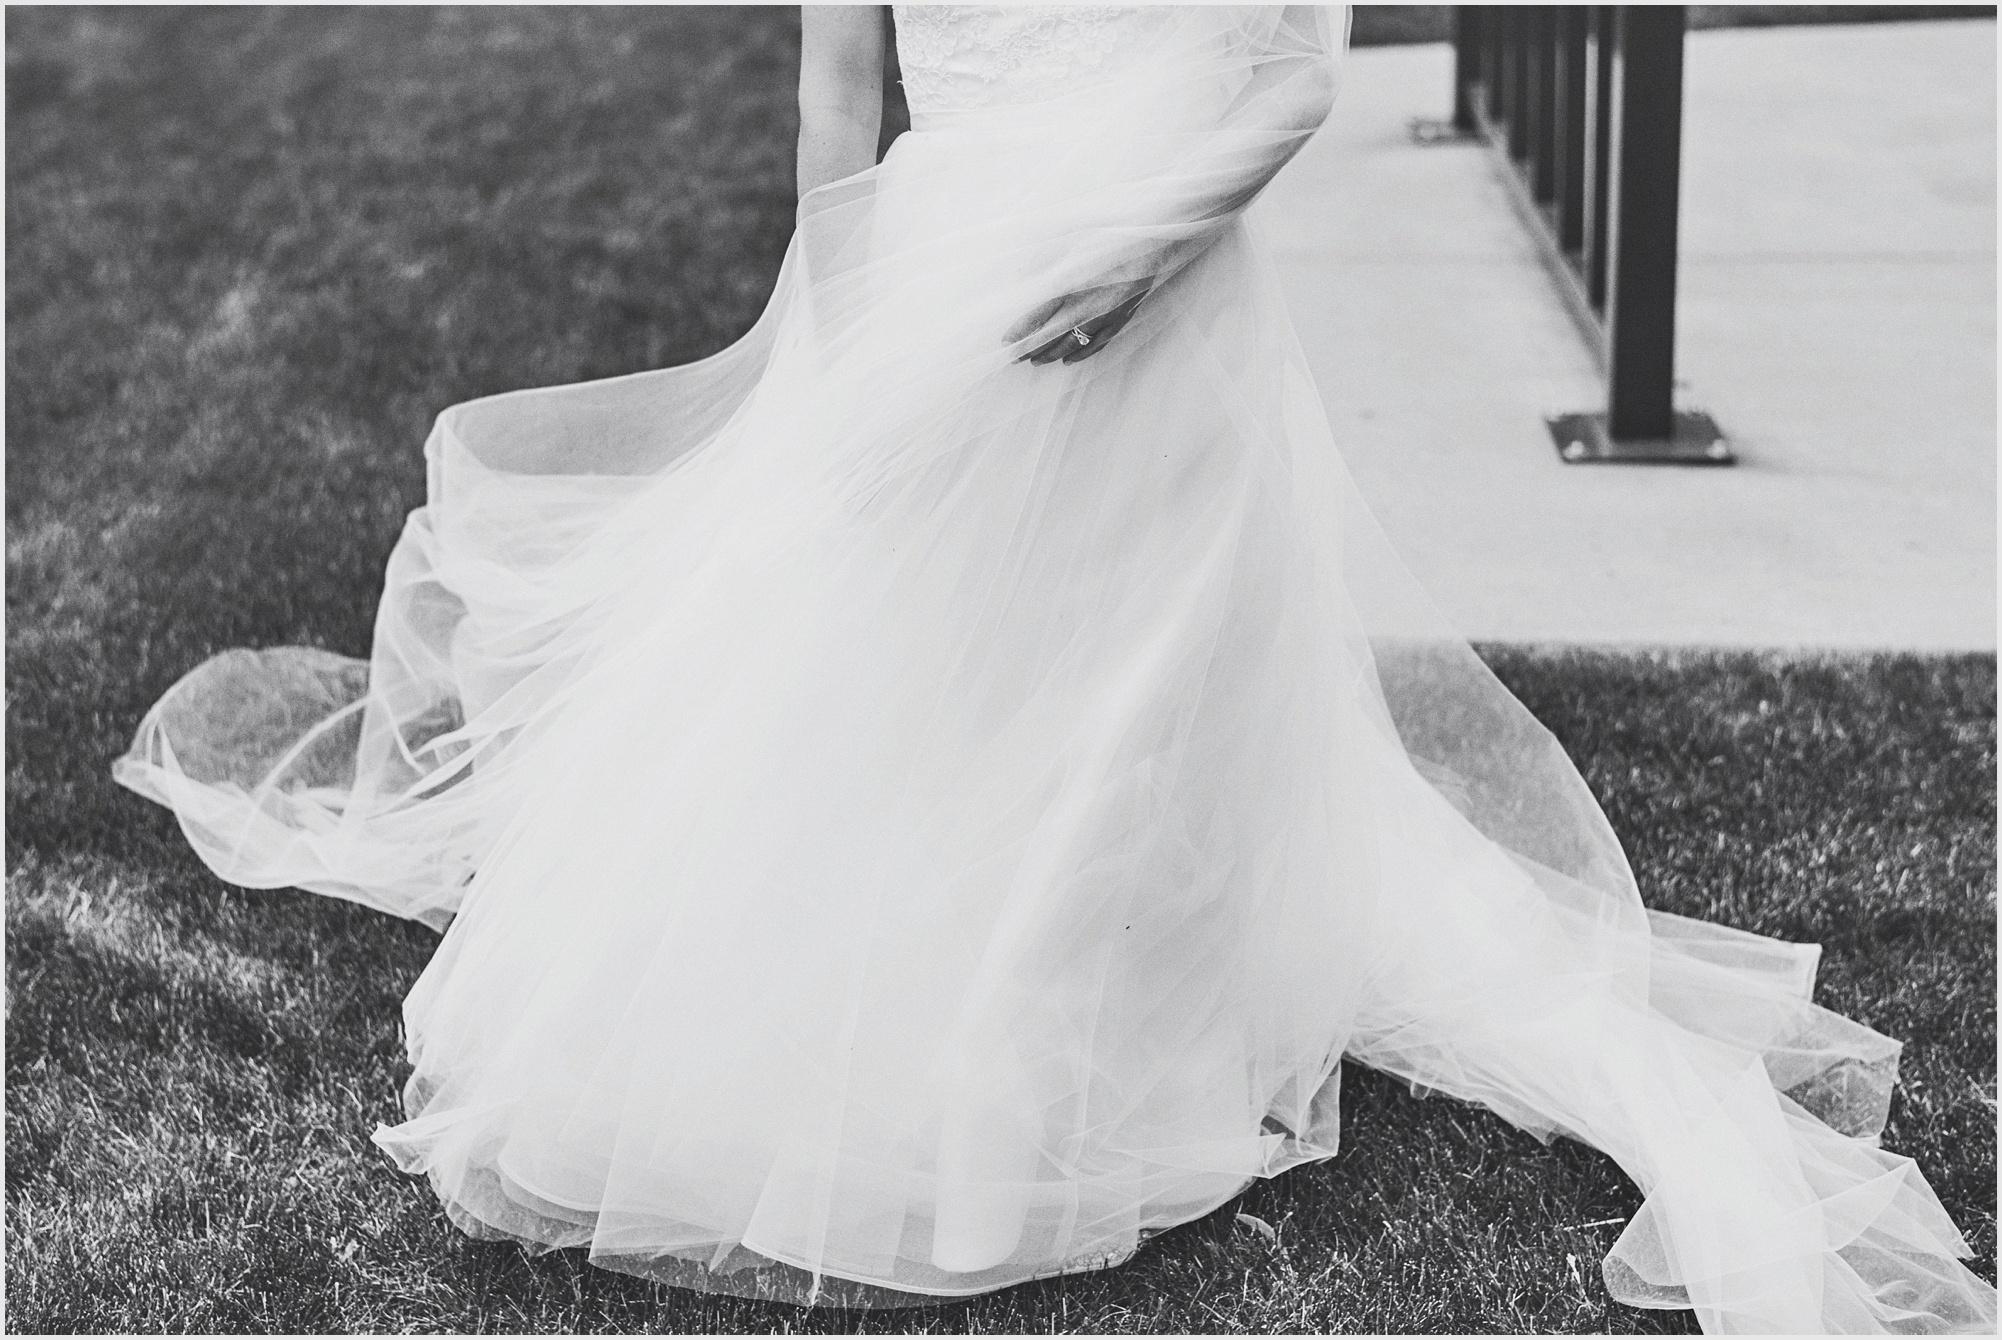 maura_david_james_j_hill_wedding_lucas_botz_photography_036.jpg